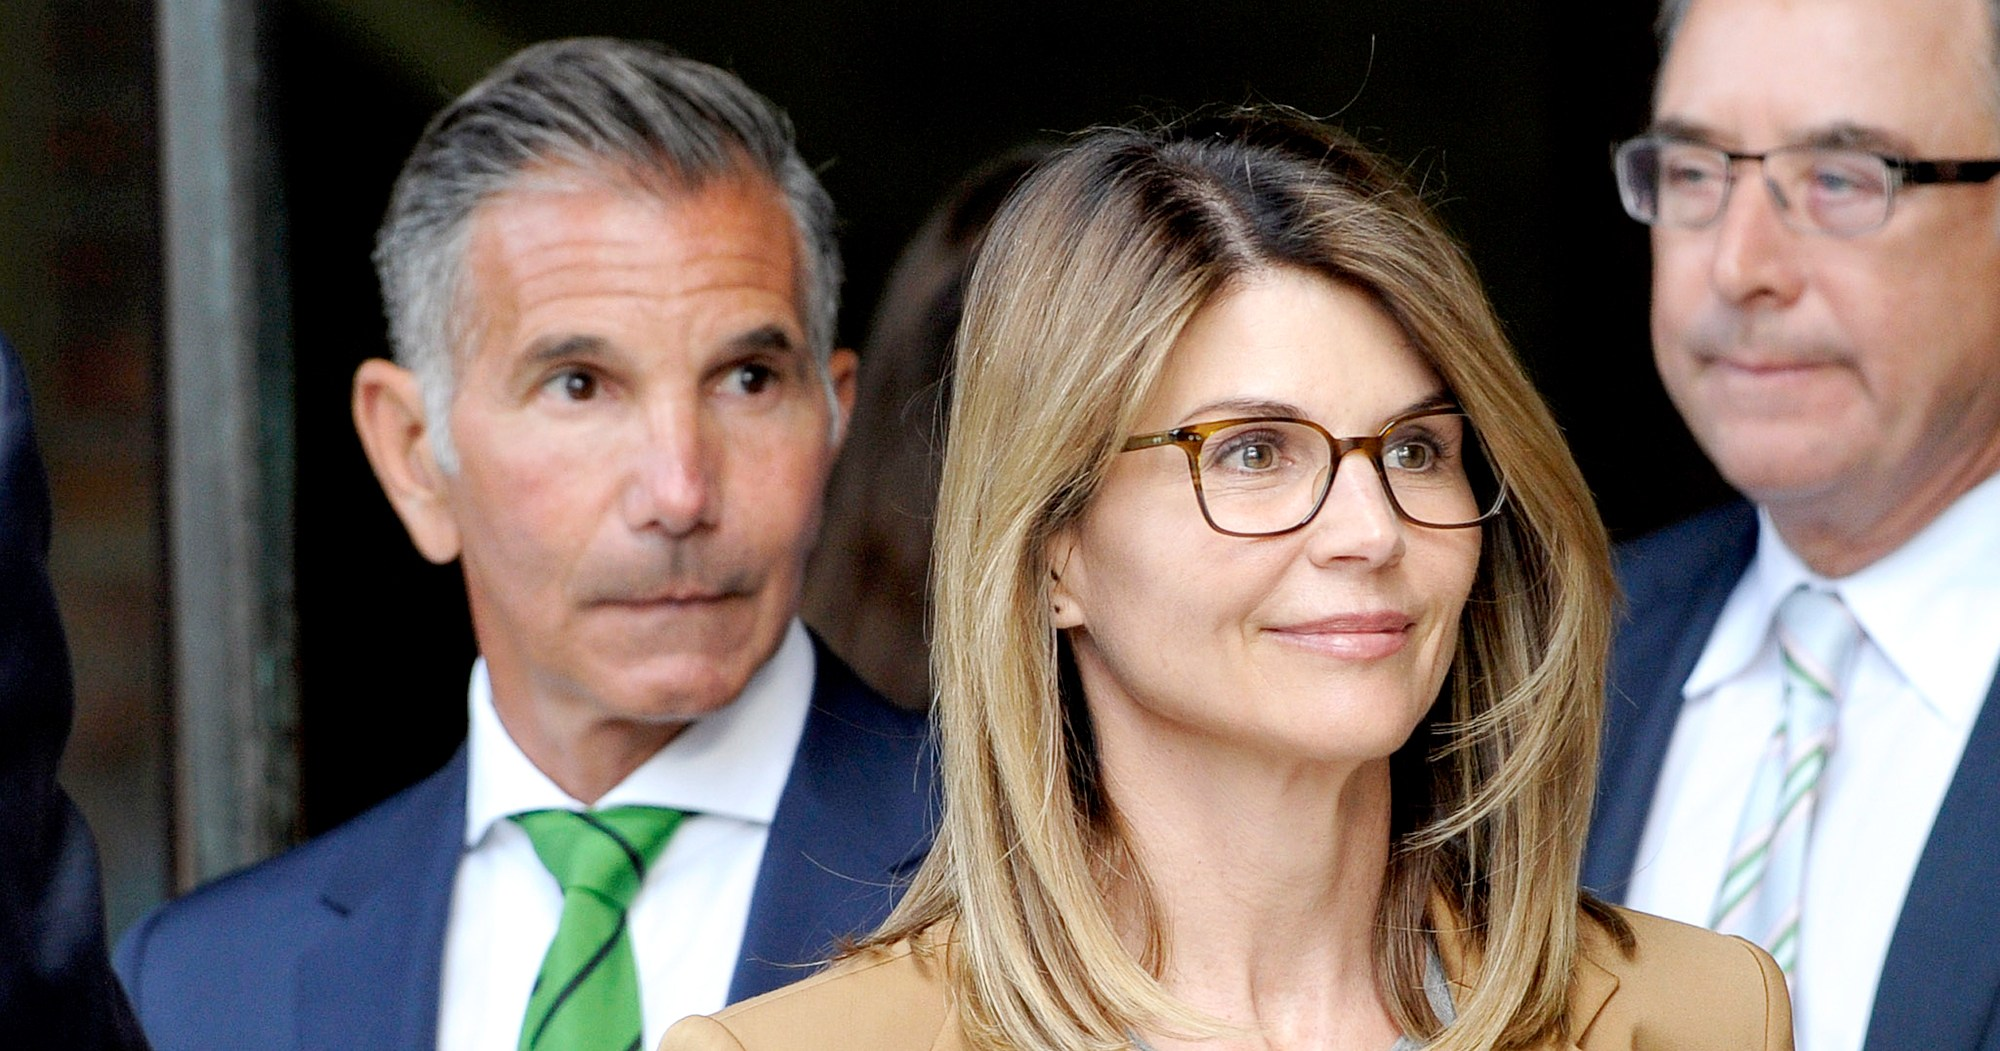 Lori Loughlin, Husband Made 'Calculated' Decision to Participate in Scandal